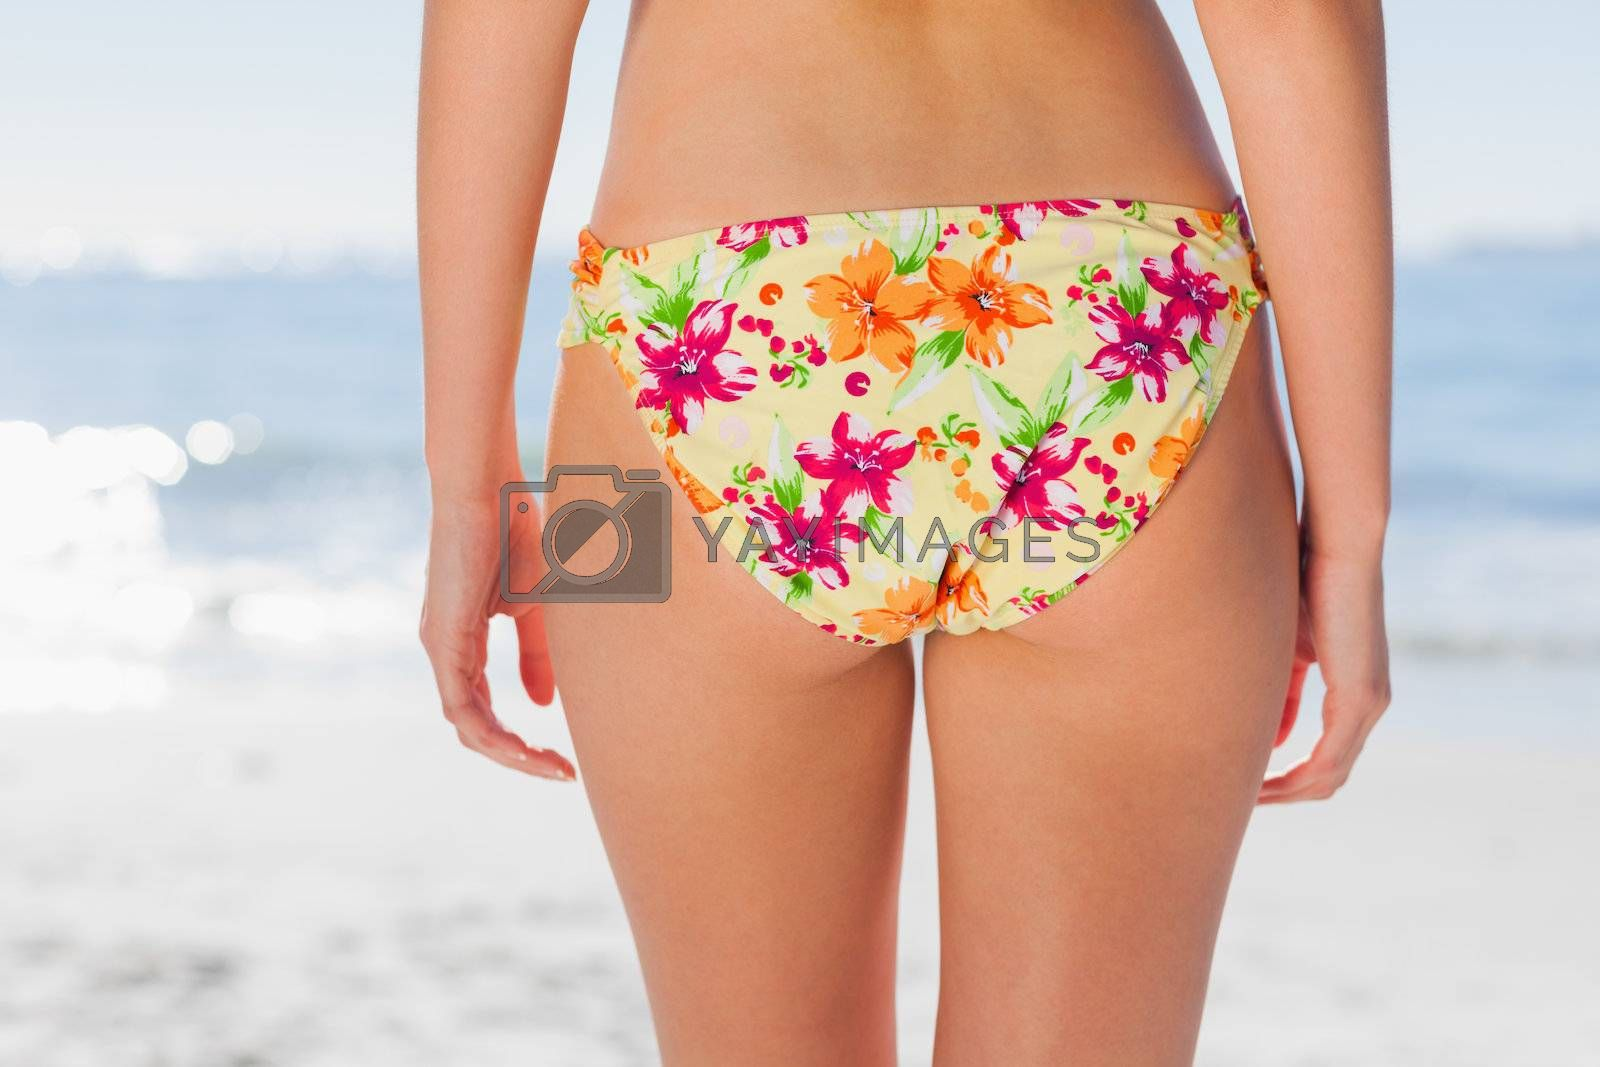 Woman in floral bikini on beach by Wavebreakmedia